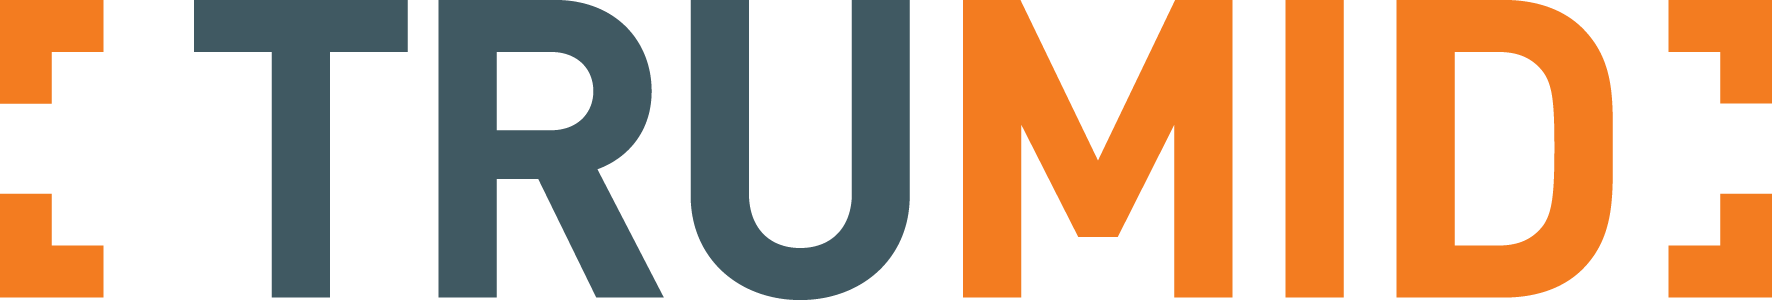 logo-duotone